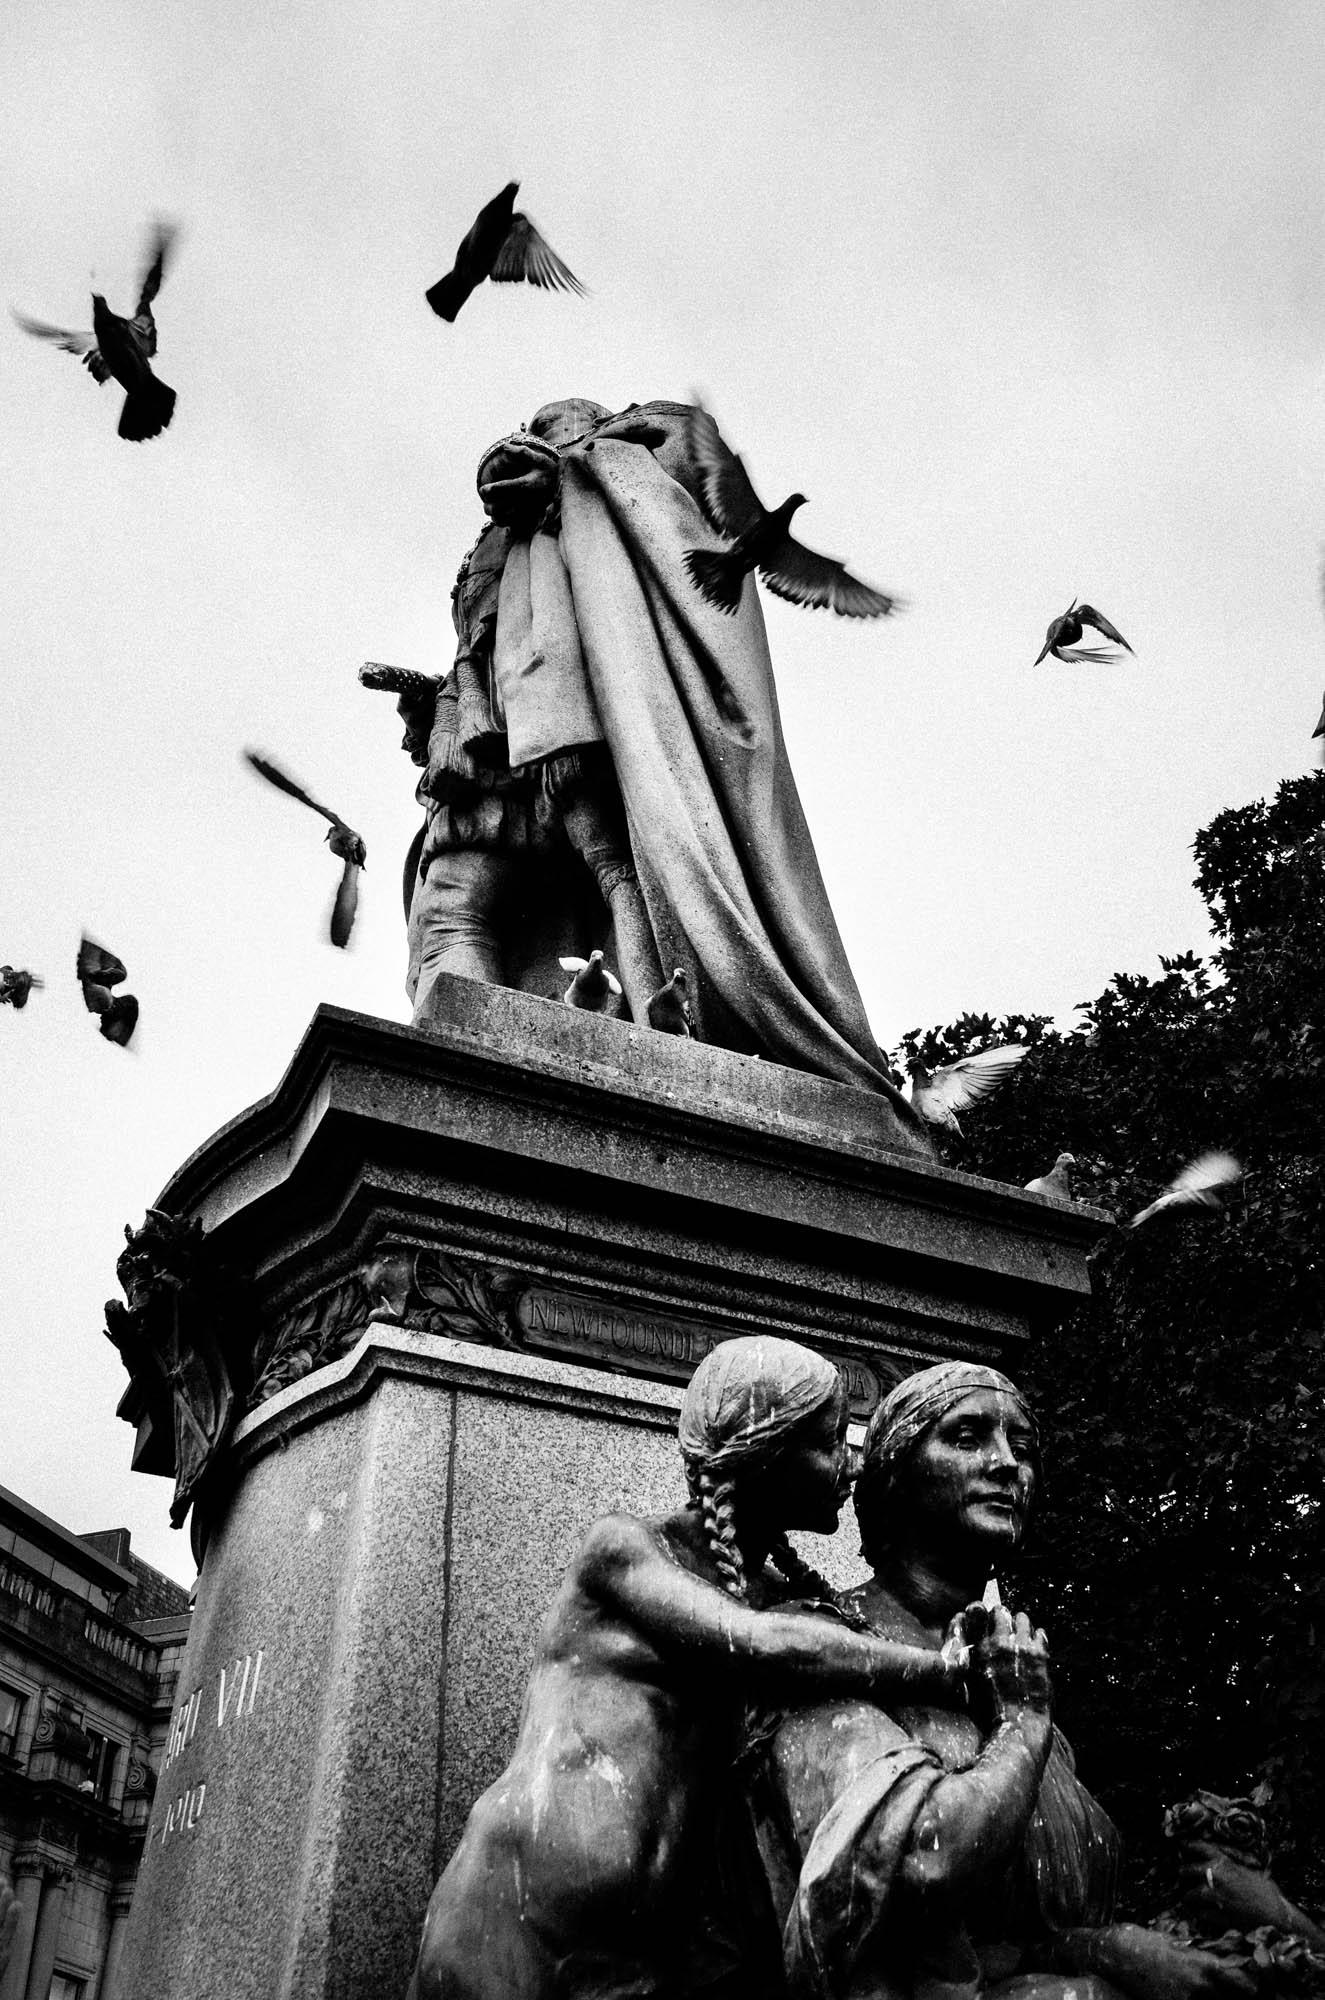 Statue in Aberdeen